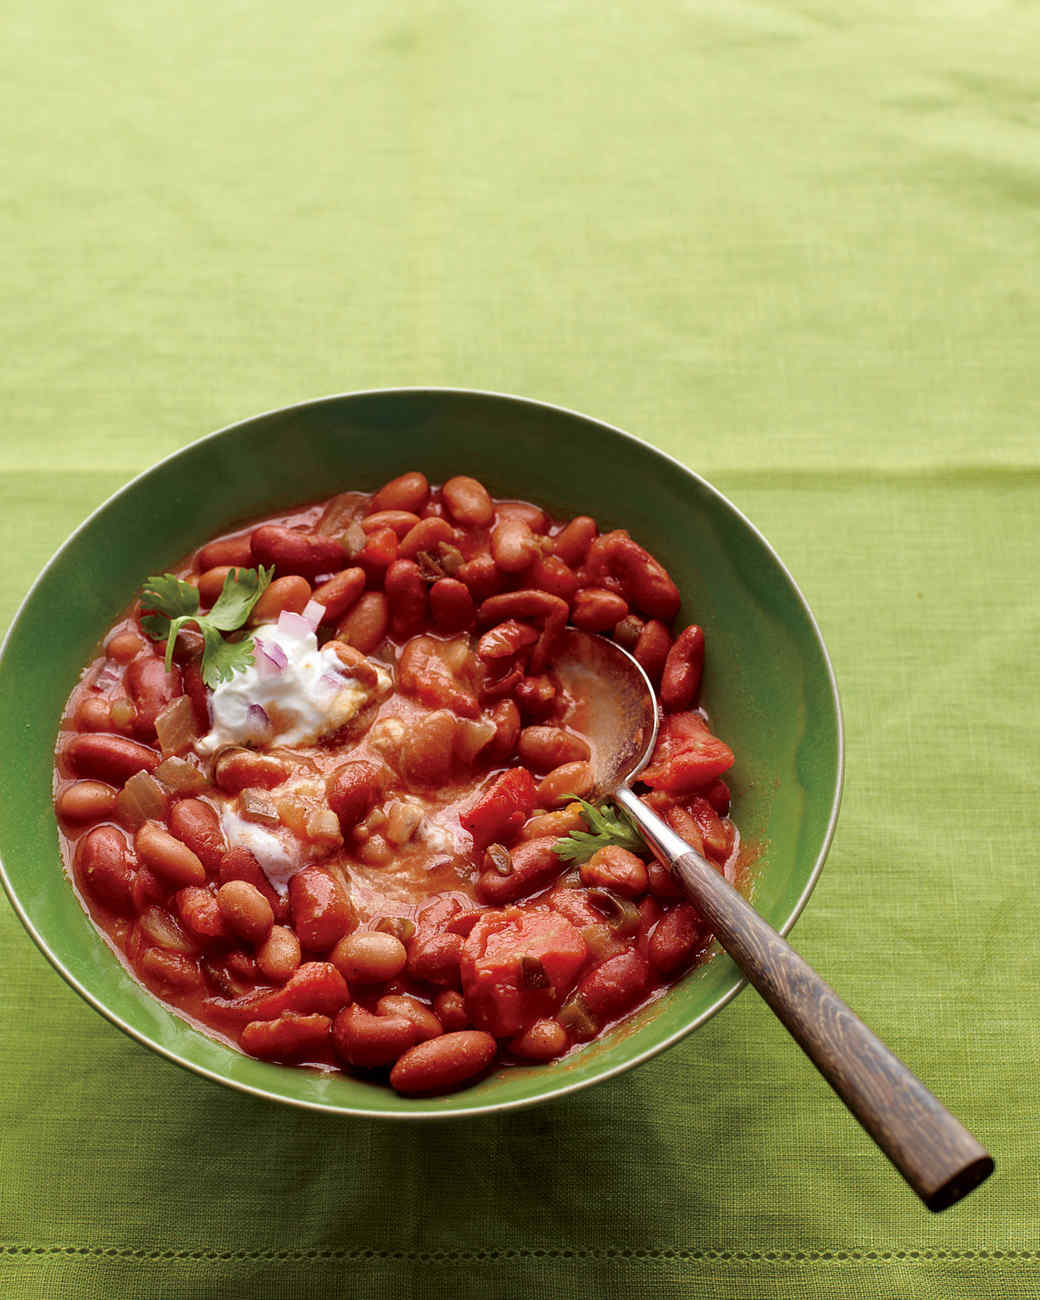 Sam's Vegetarian Bean Chili